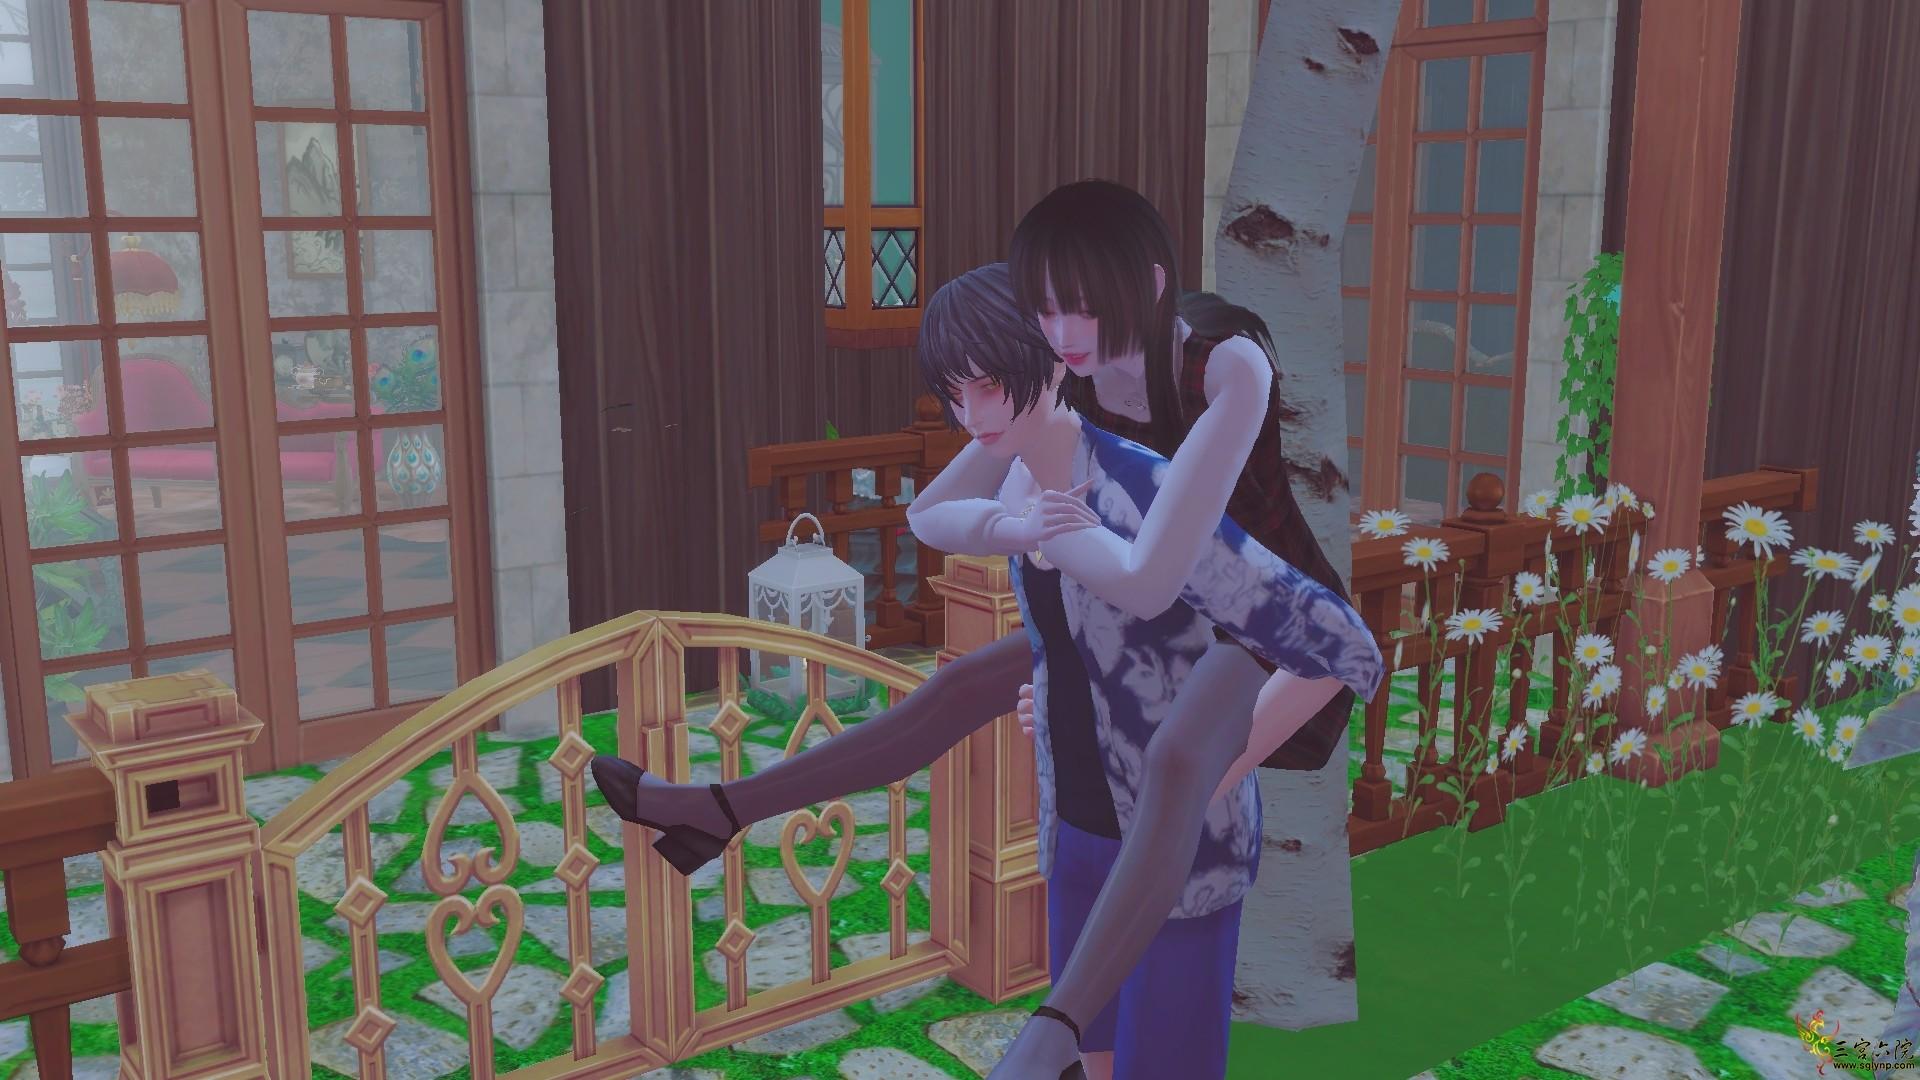 The Sims 4 2020_5_31 23_30_28_副本.jpg